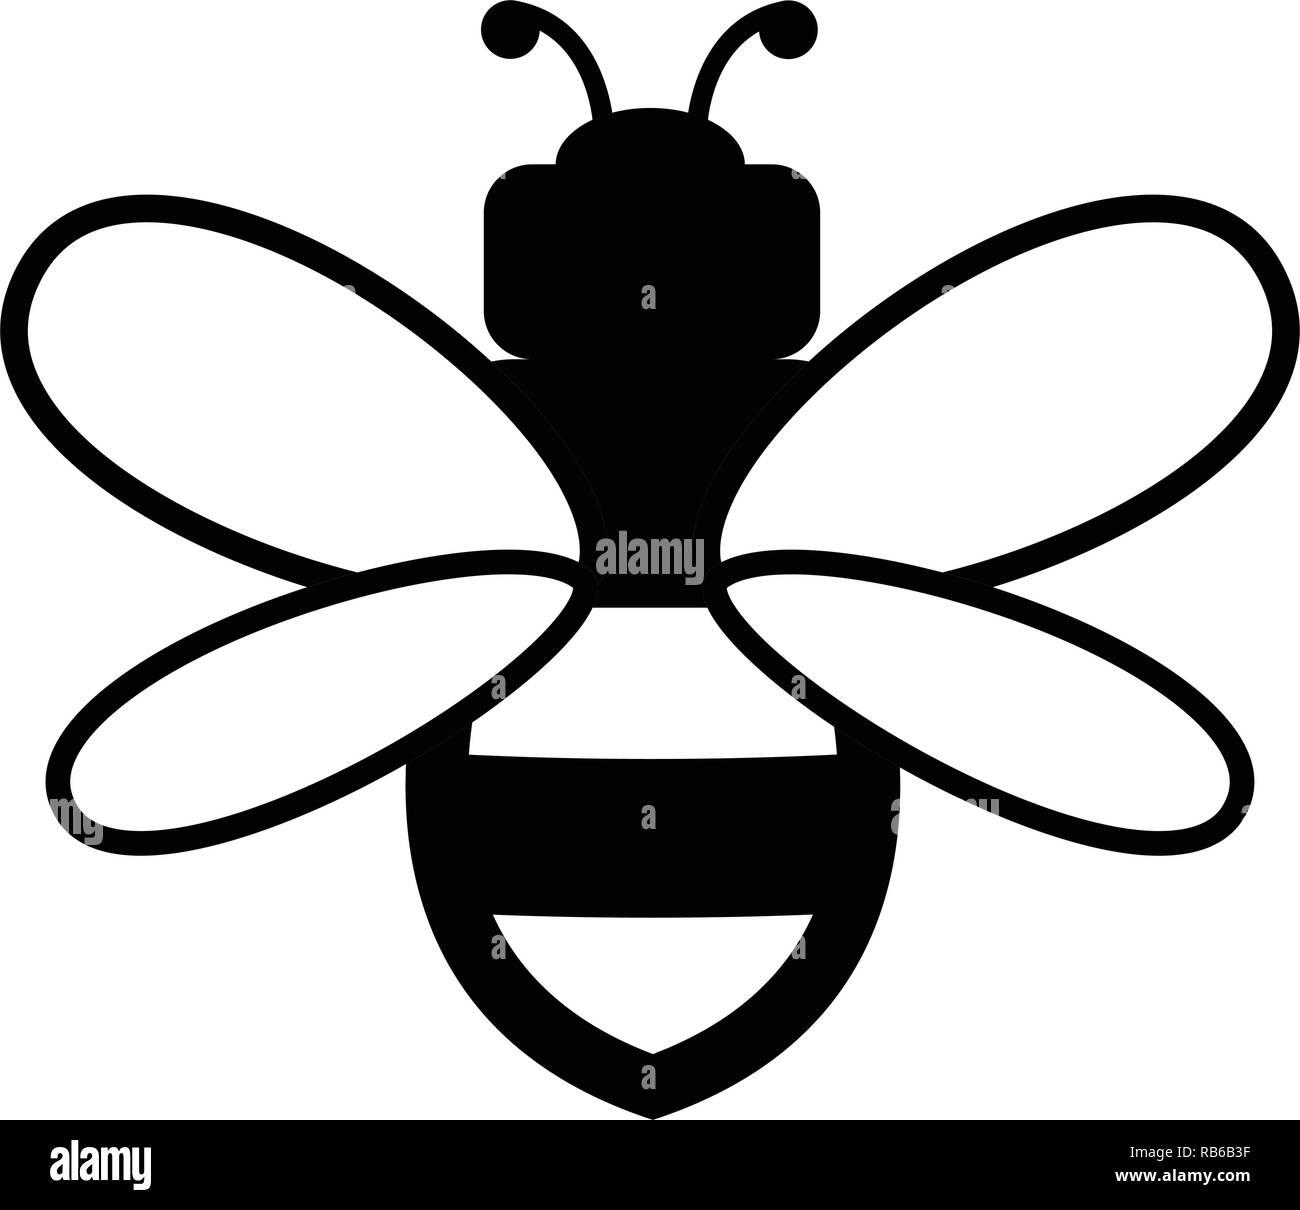 vector bee icon isolated on white background.flat bumblebee logo  cartoon. honey bee simple illustration - Stock Image